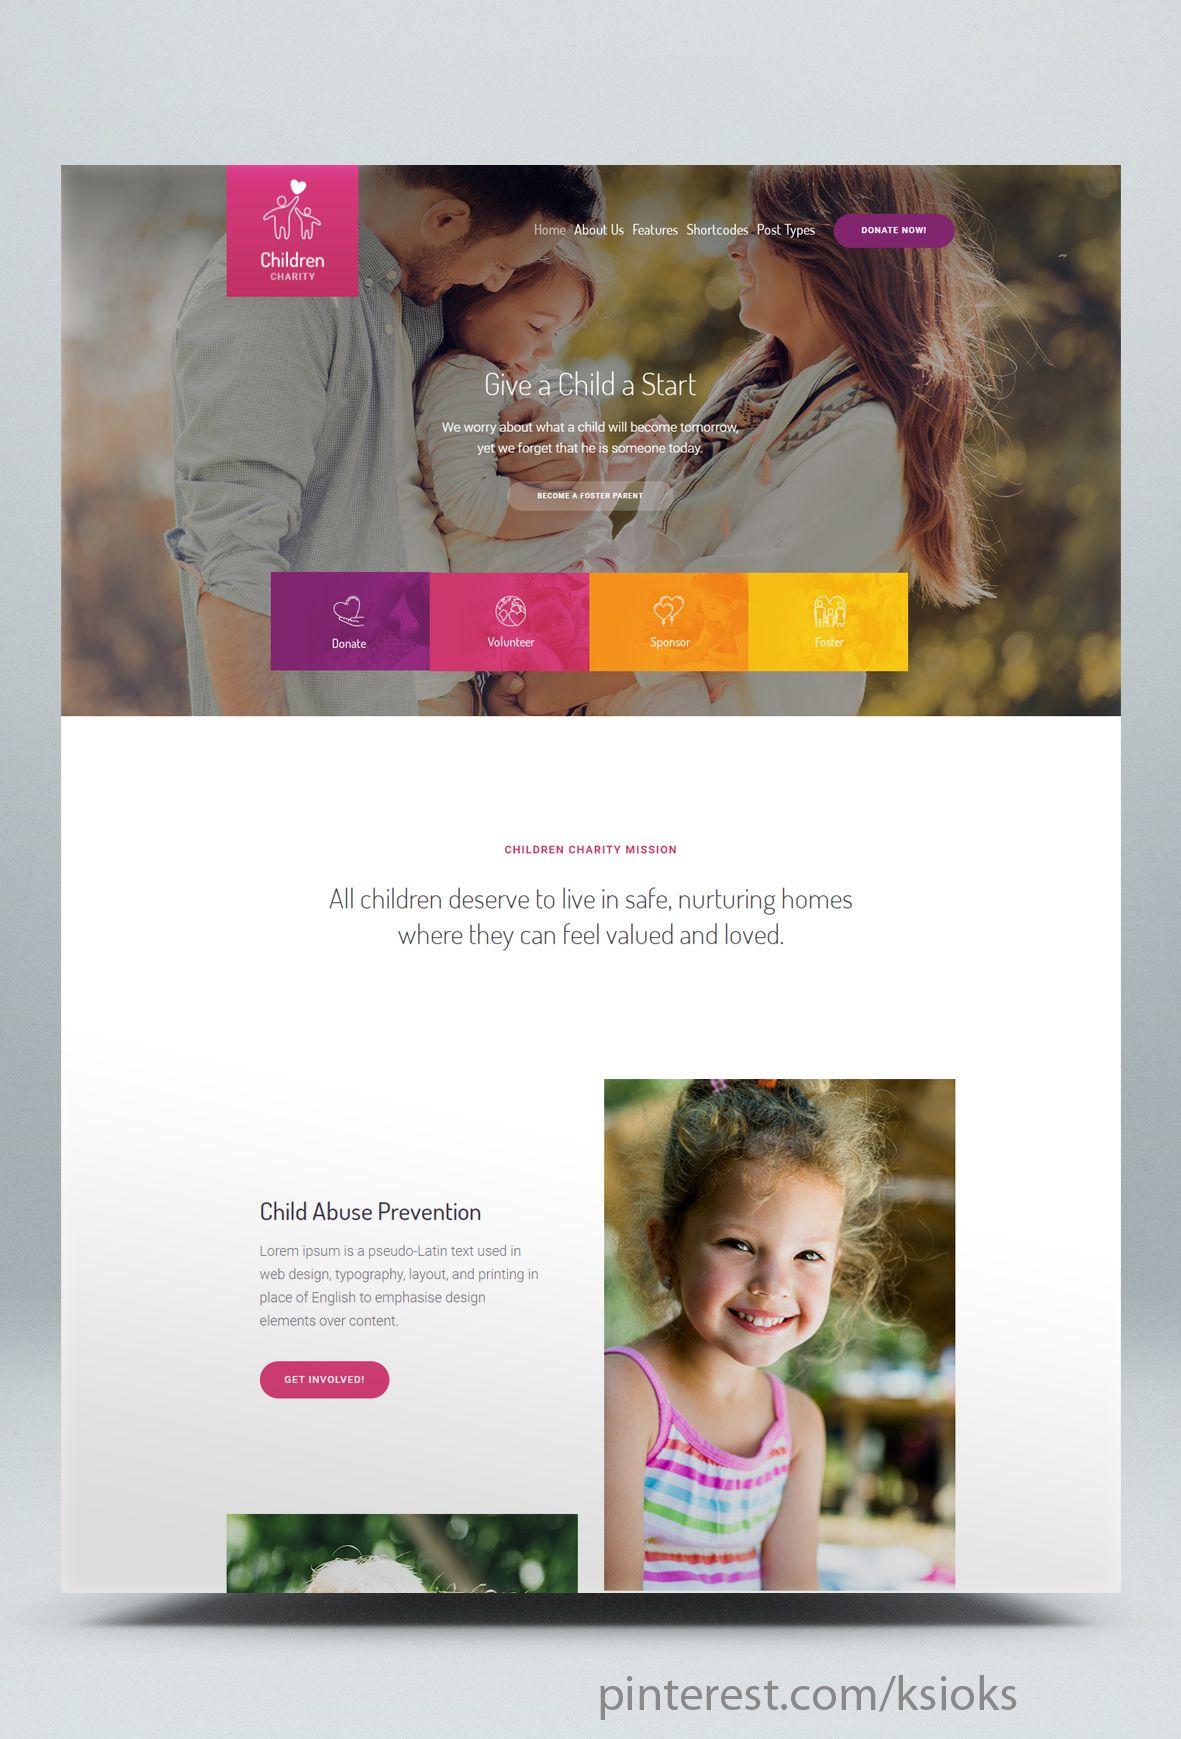 Children Charity Nonprofit Ngo Wordpress Theme Children Charity Charity Charity Organizations